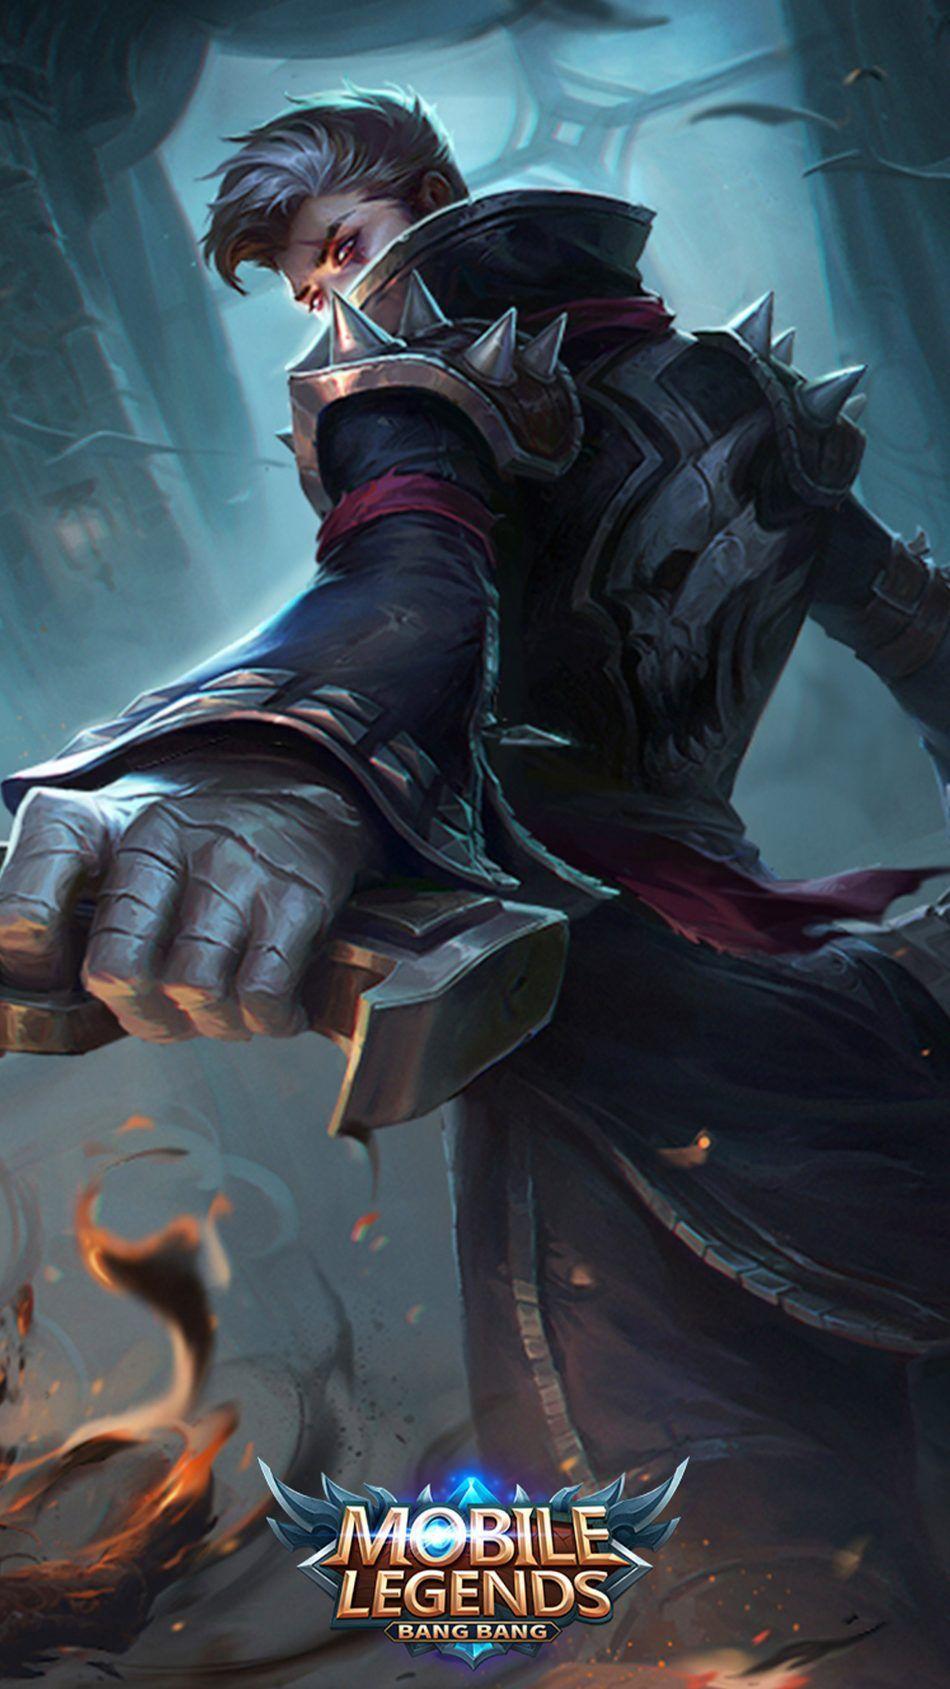 Alucard Mobile Legends Wallpapers Top Free Alucard Mobile